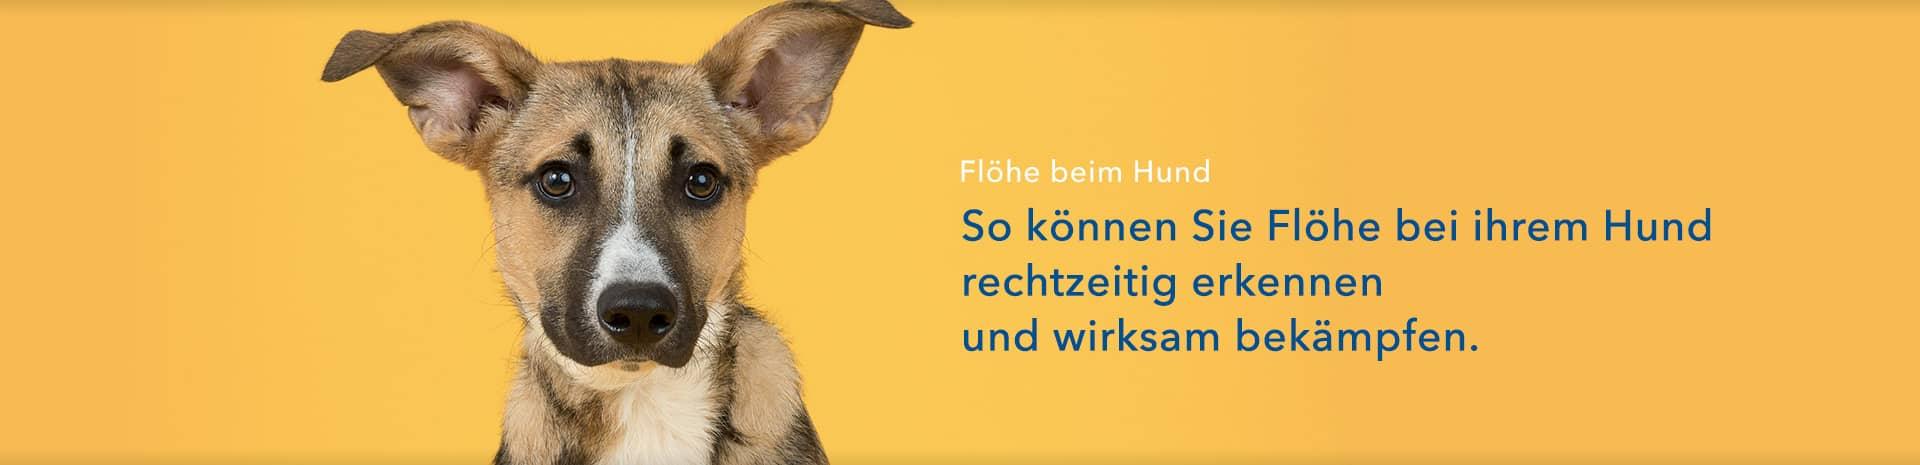 Flöhe beim Hund - Ratgeber - shop-apotheke.com